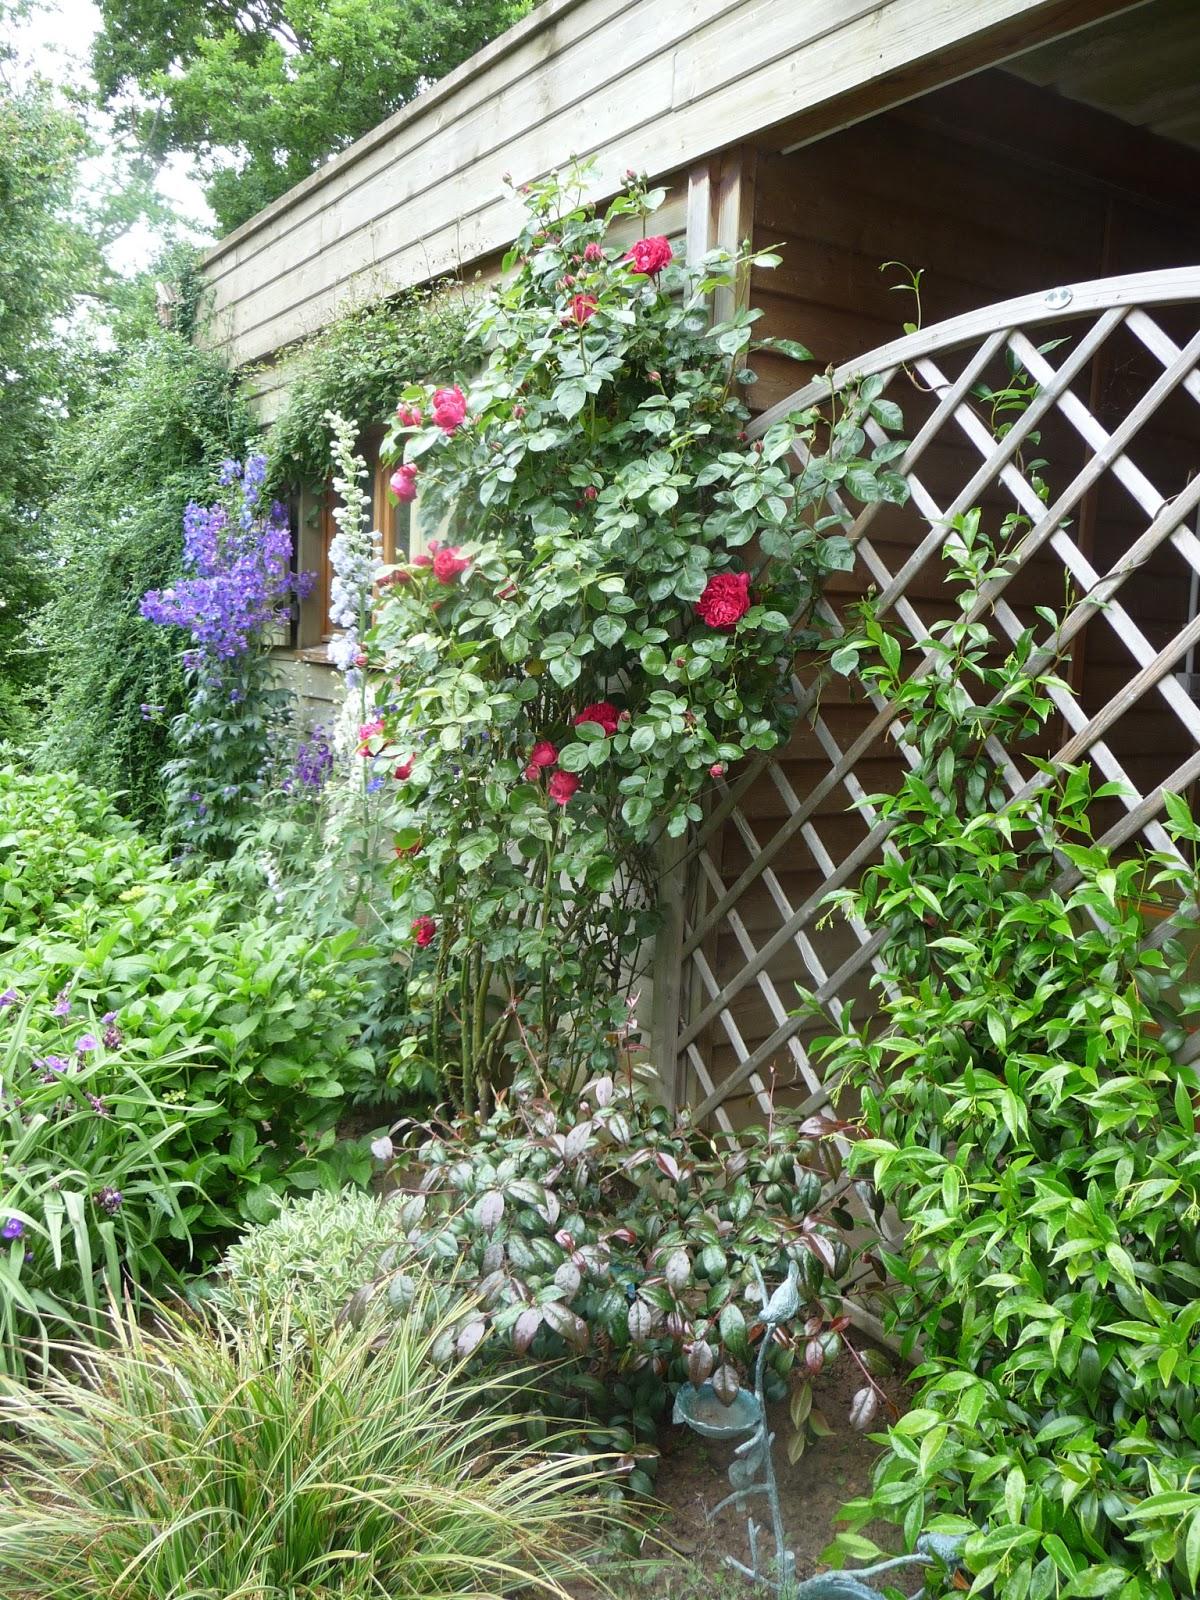 Ma terre de bruy re humeur maussade for Cabane de jardin que choisir